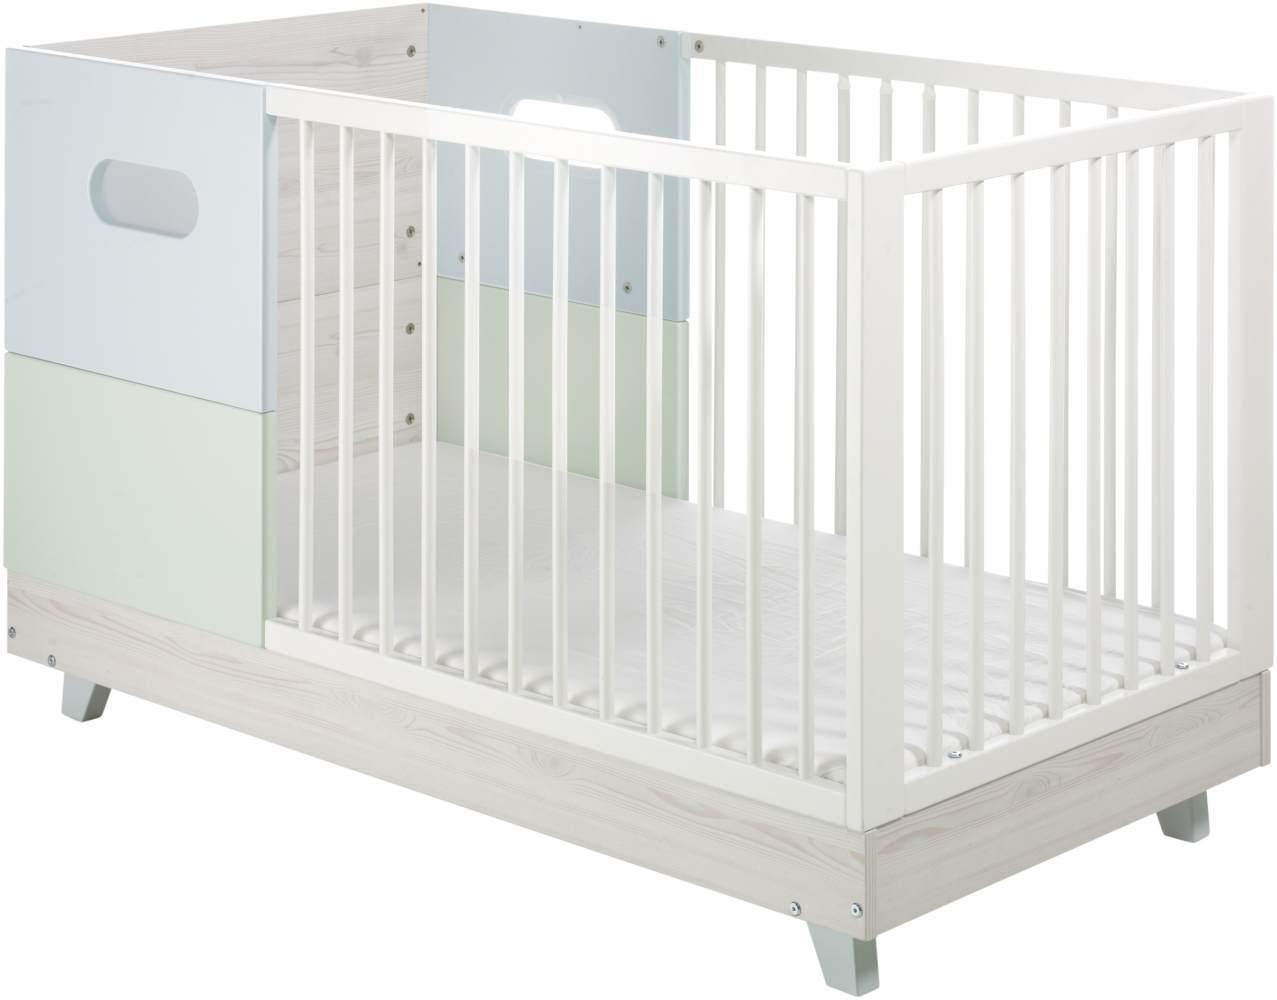 Geuther Kinderbett MOMO 70x140cm Bild 1